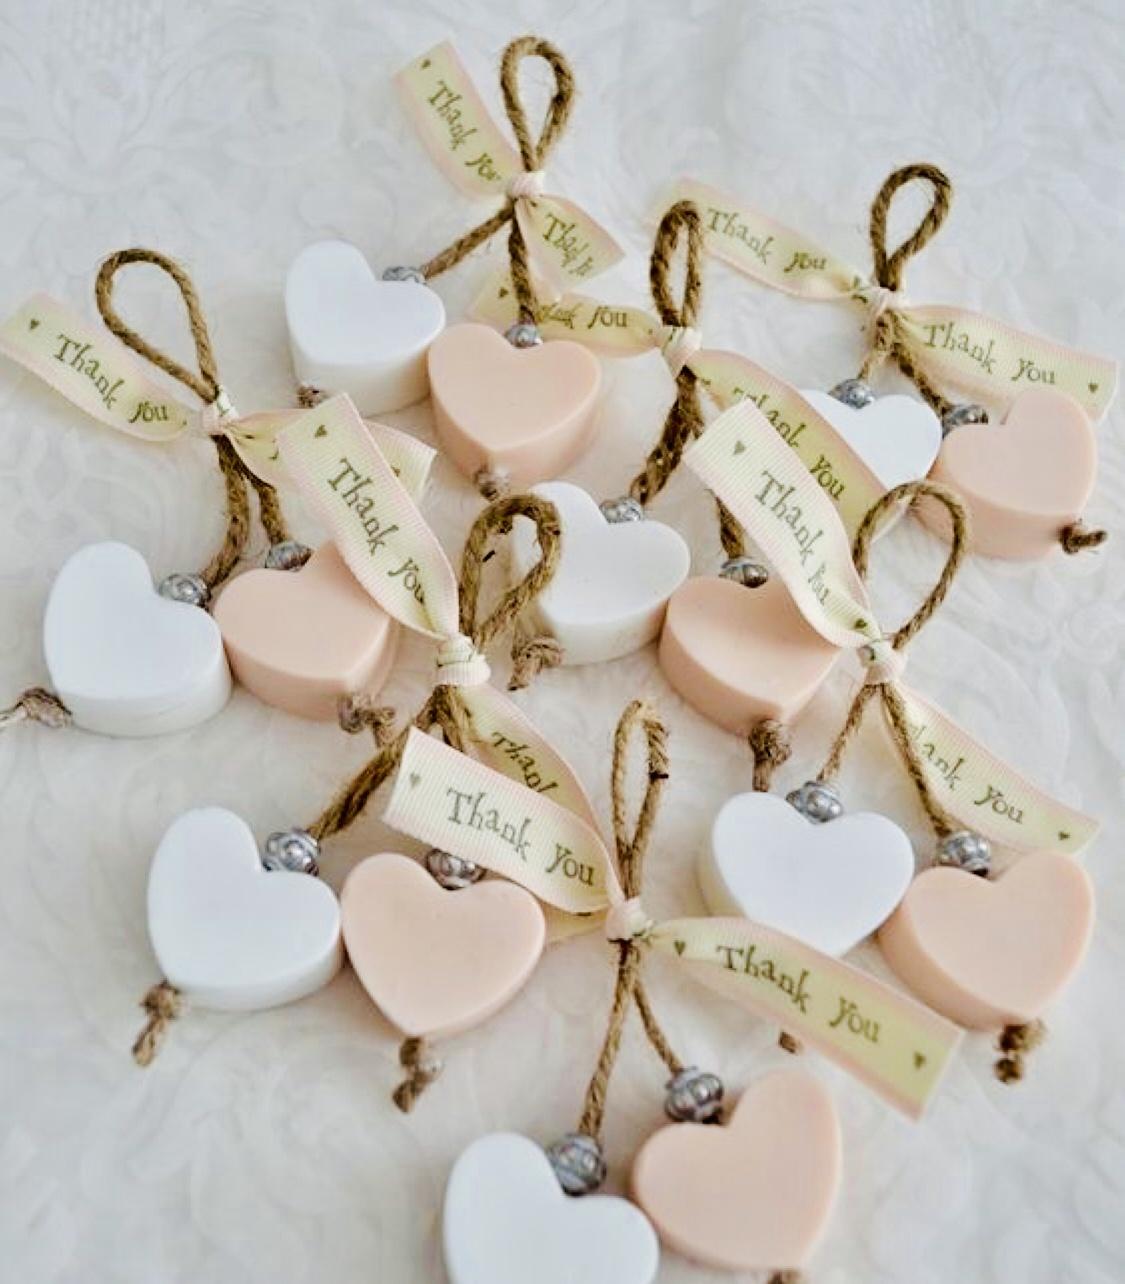 huwelijksbedankjes ideeën